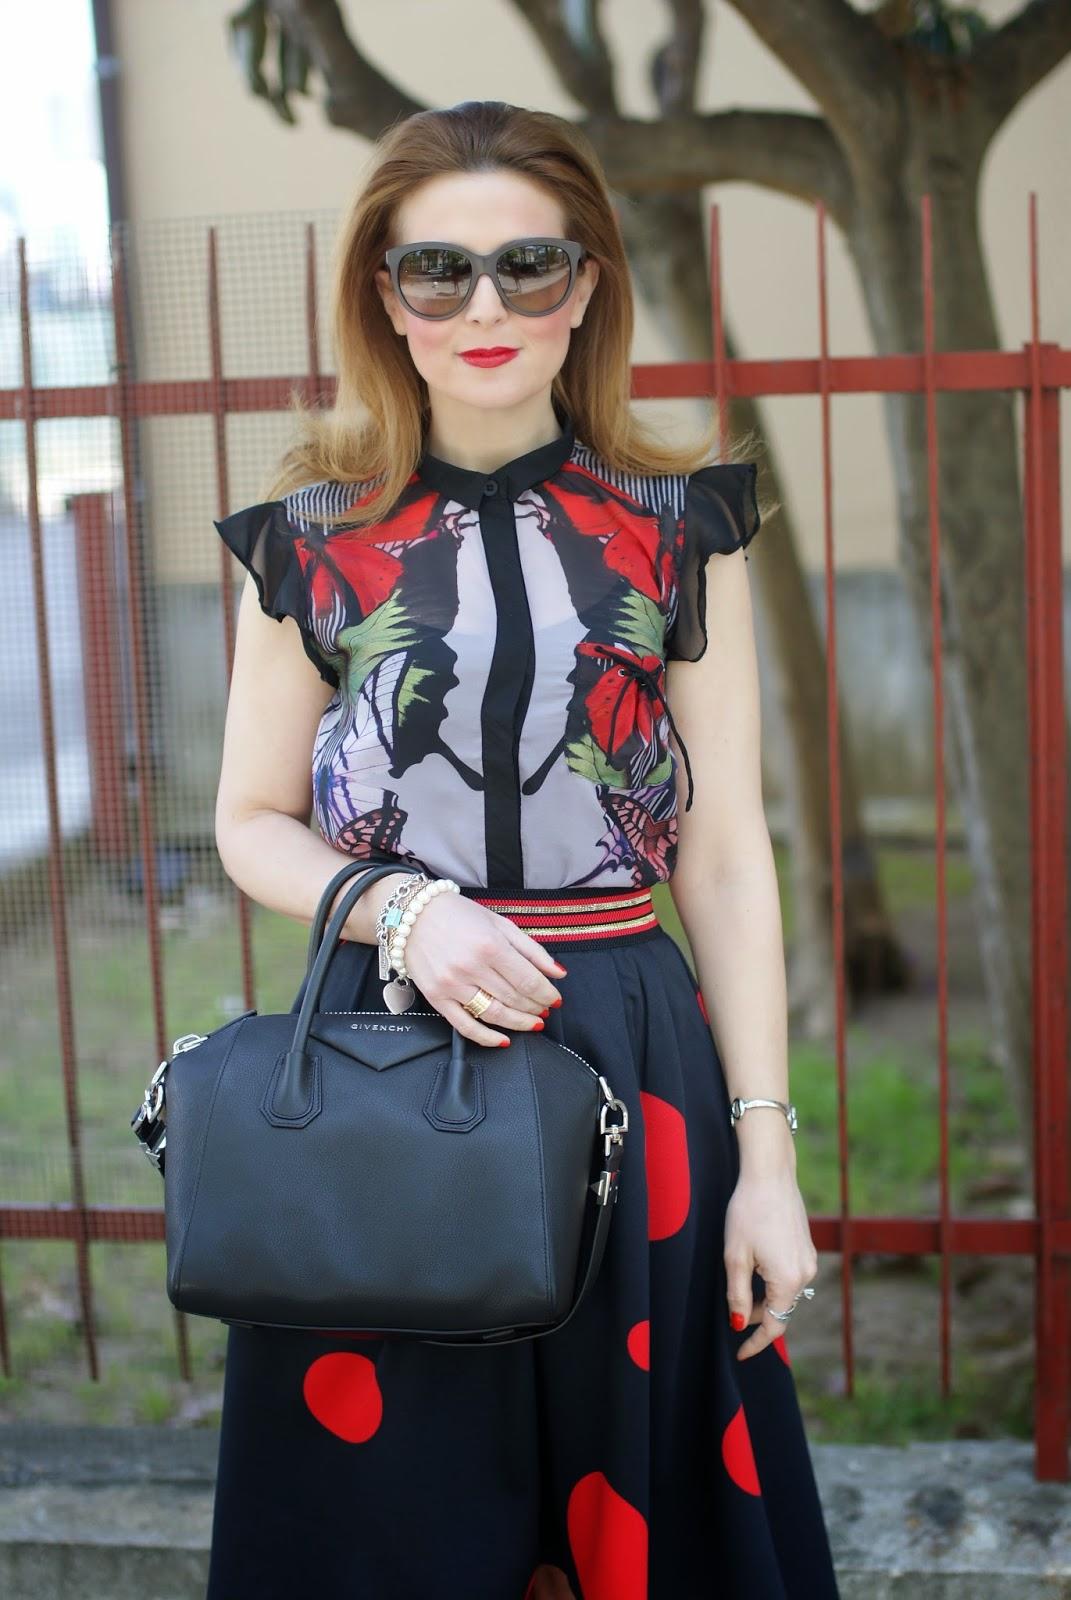 Smash! Saura blouse, Givenchy Antigona bag, Zaful polka dot skirt, large polka dot print, mix of prints on Fashion and Cookies fashion blog, fashion blogger style